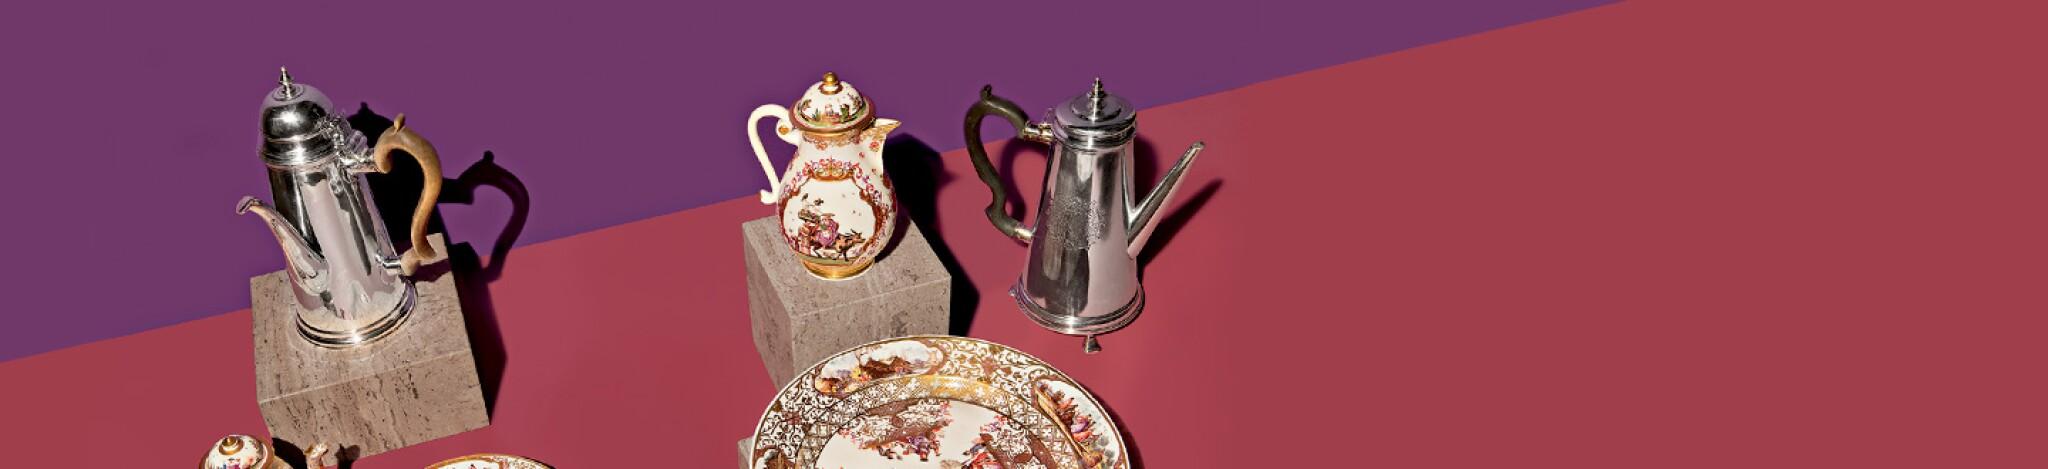 Style: Silver, Ceramics, Furniture